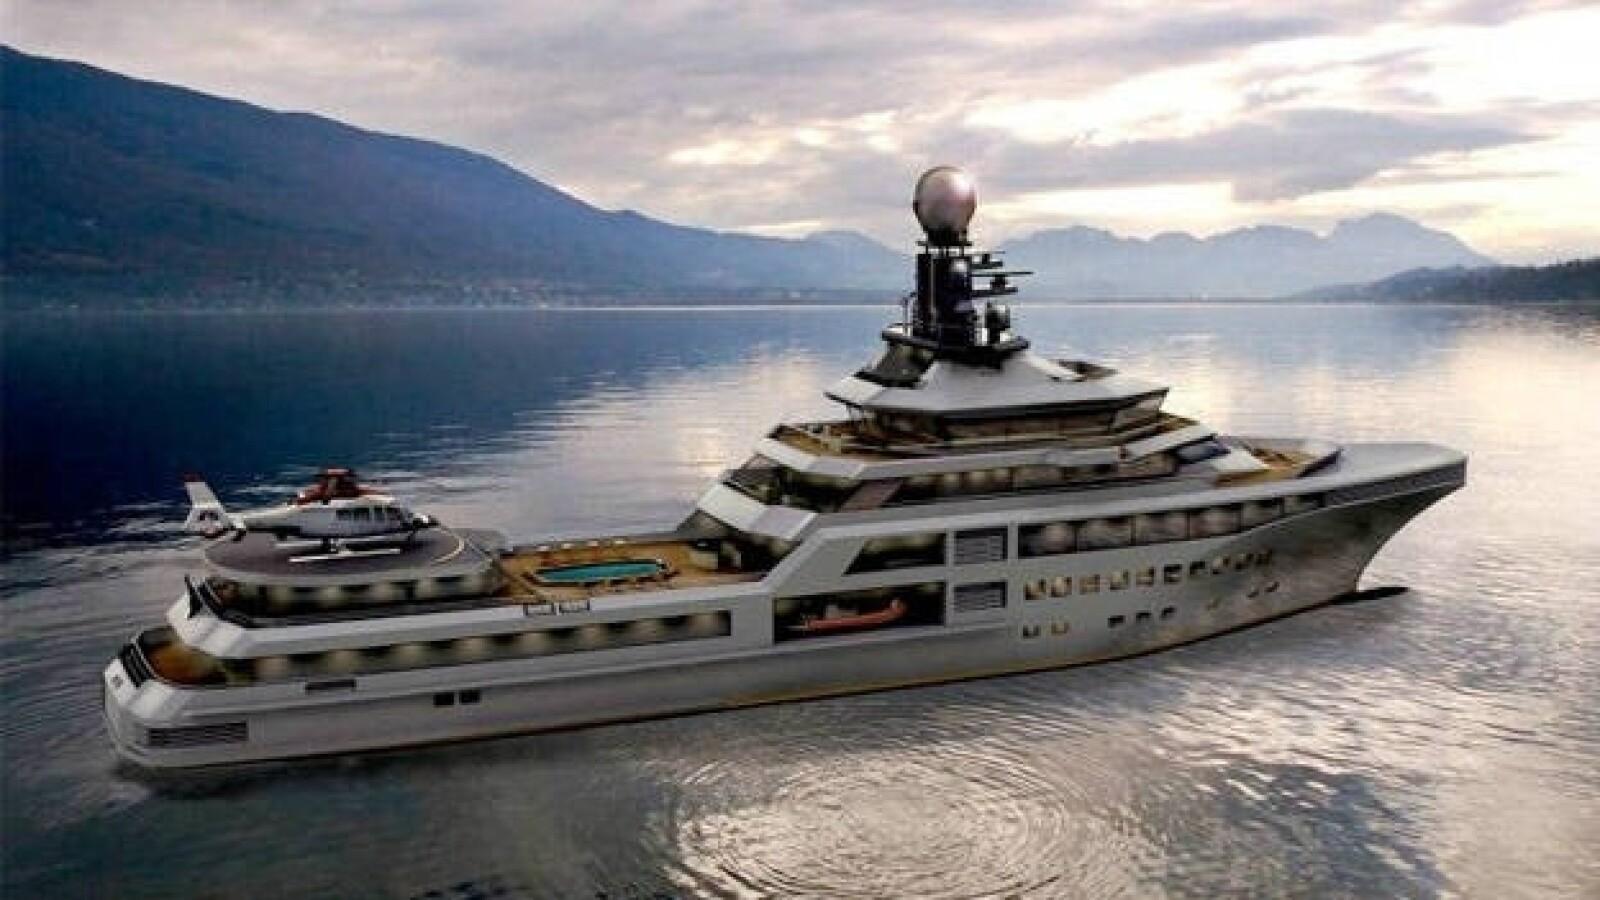 yate super pj world noruega embarcacion barco lujo